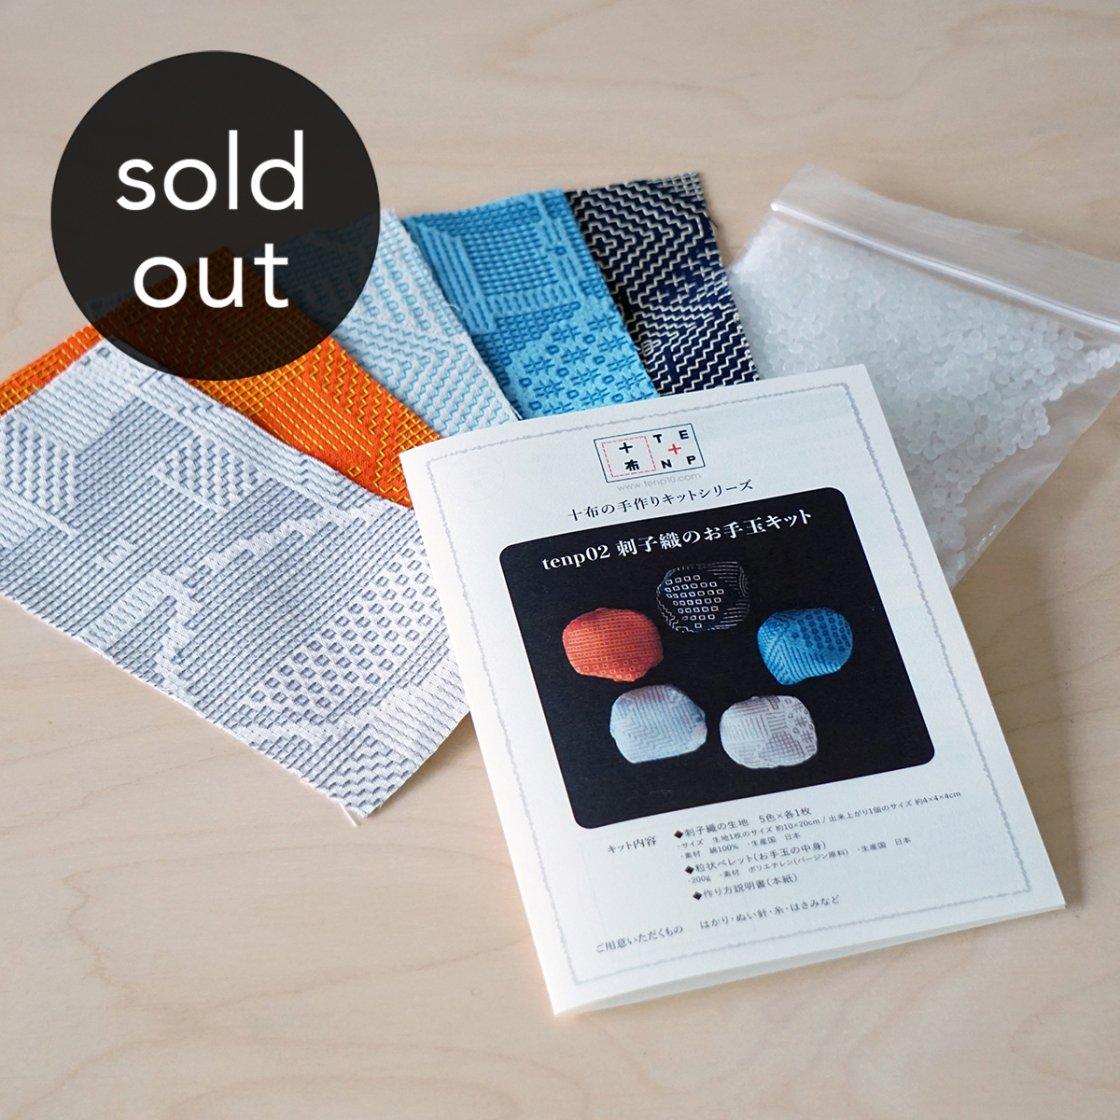 tenp02 刺子織のお手玉キット